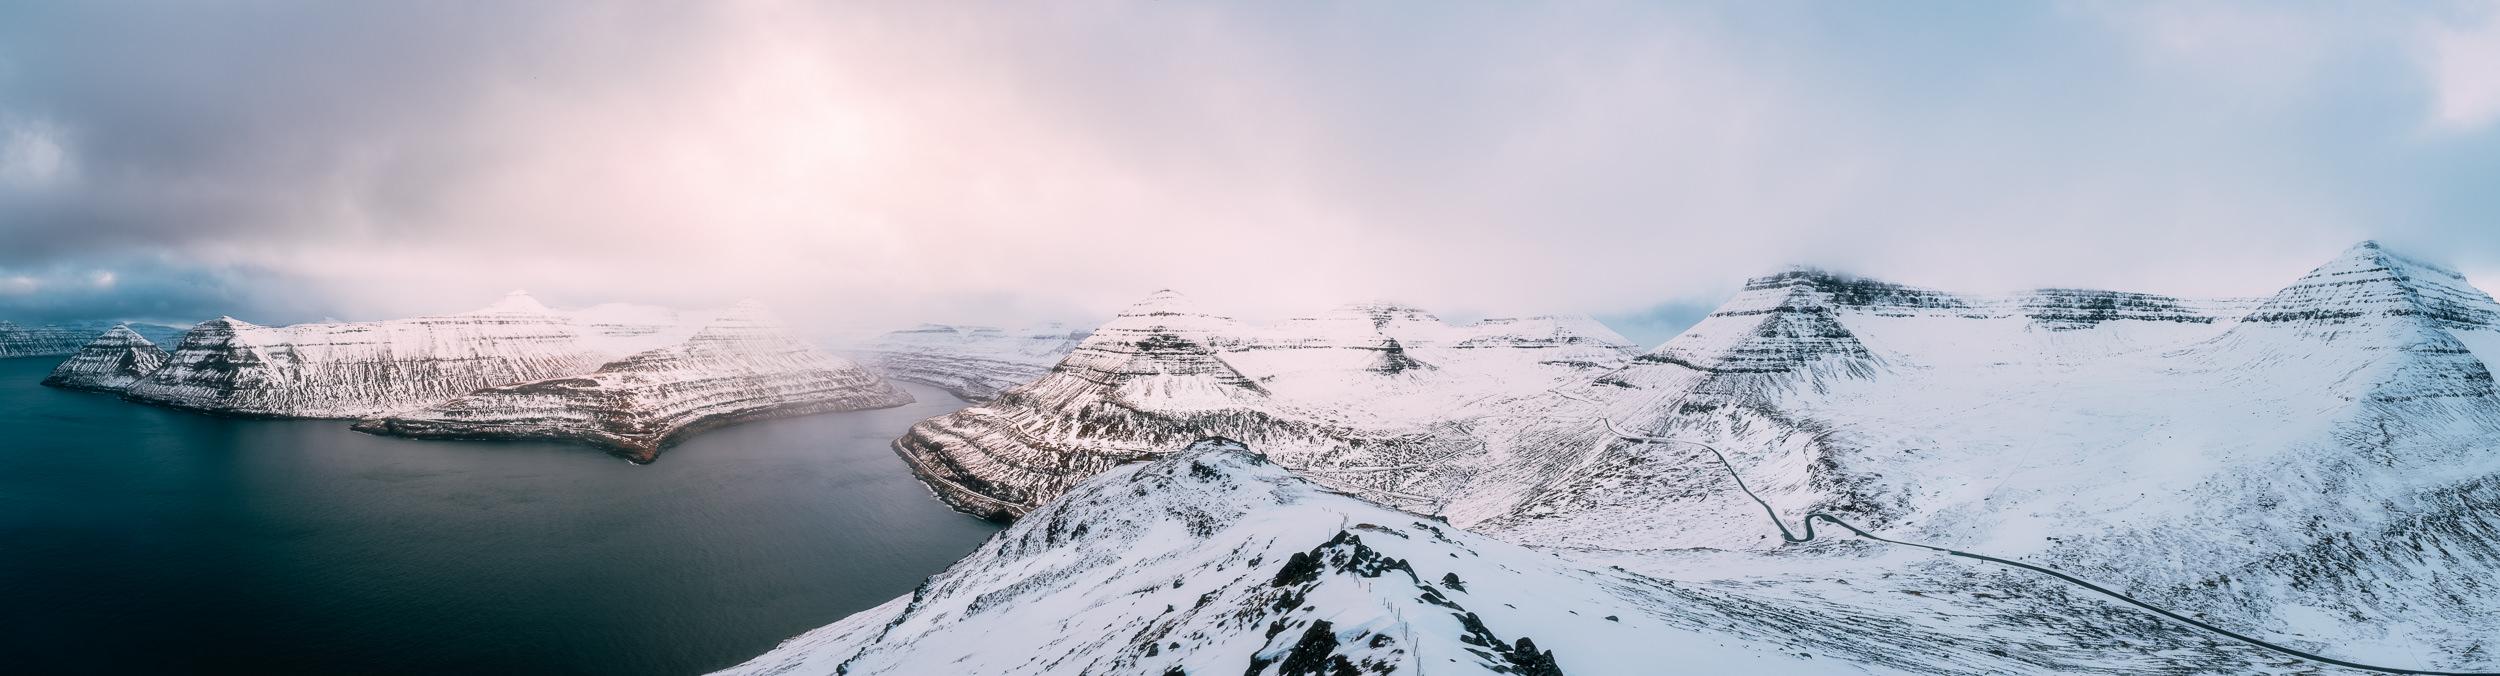 2019.02.06_Faroe_Coast_Eysturoy_Hike_A7III-8736-Pano-Edit.jpg